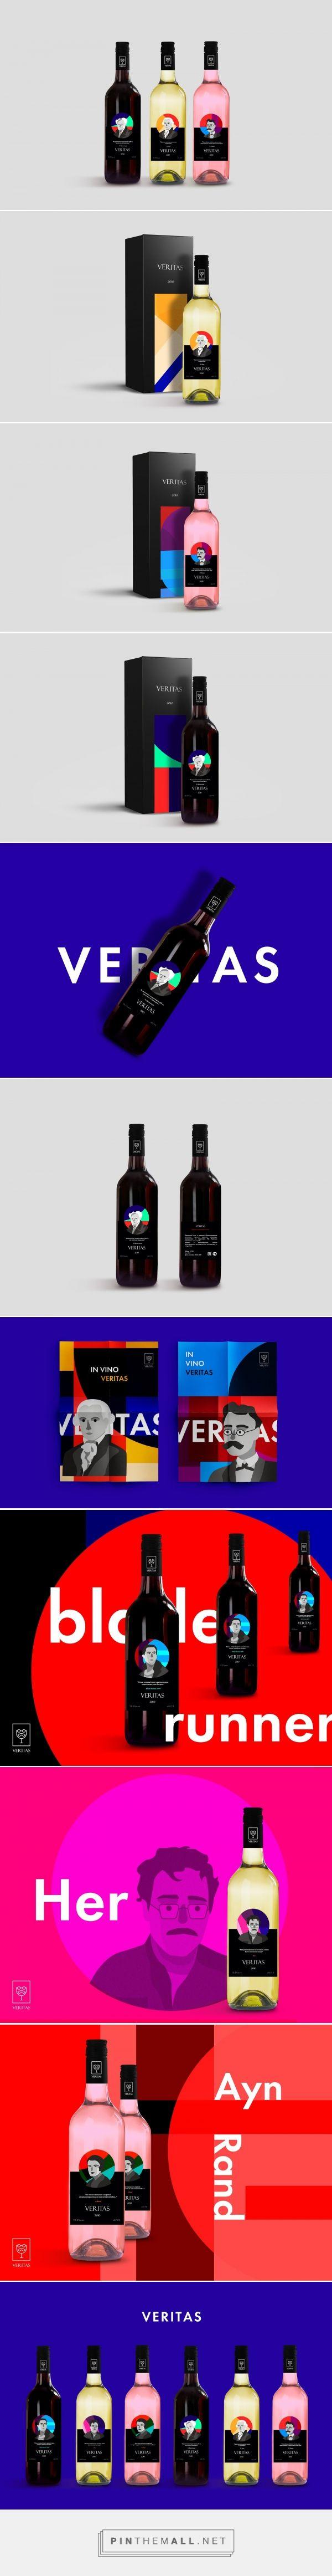 Veritas Wine - Packaging of the World - Creative Package Design Gallery - http://www.packagingoftheworld.com/2017/10/veritas.html